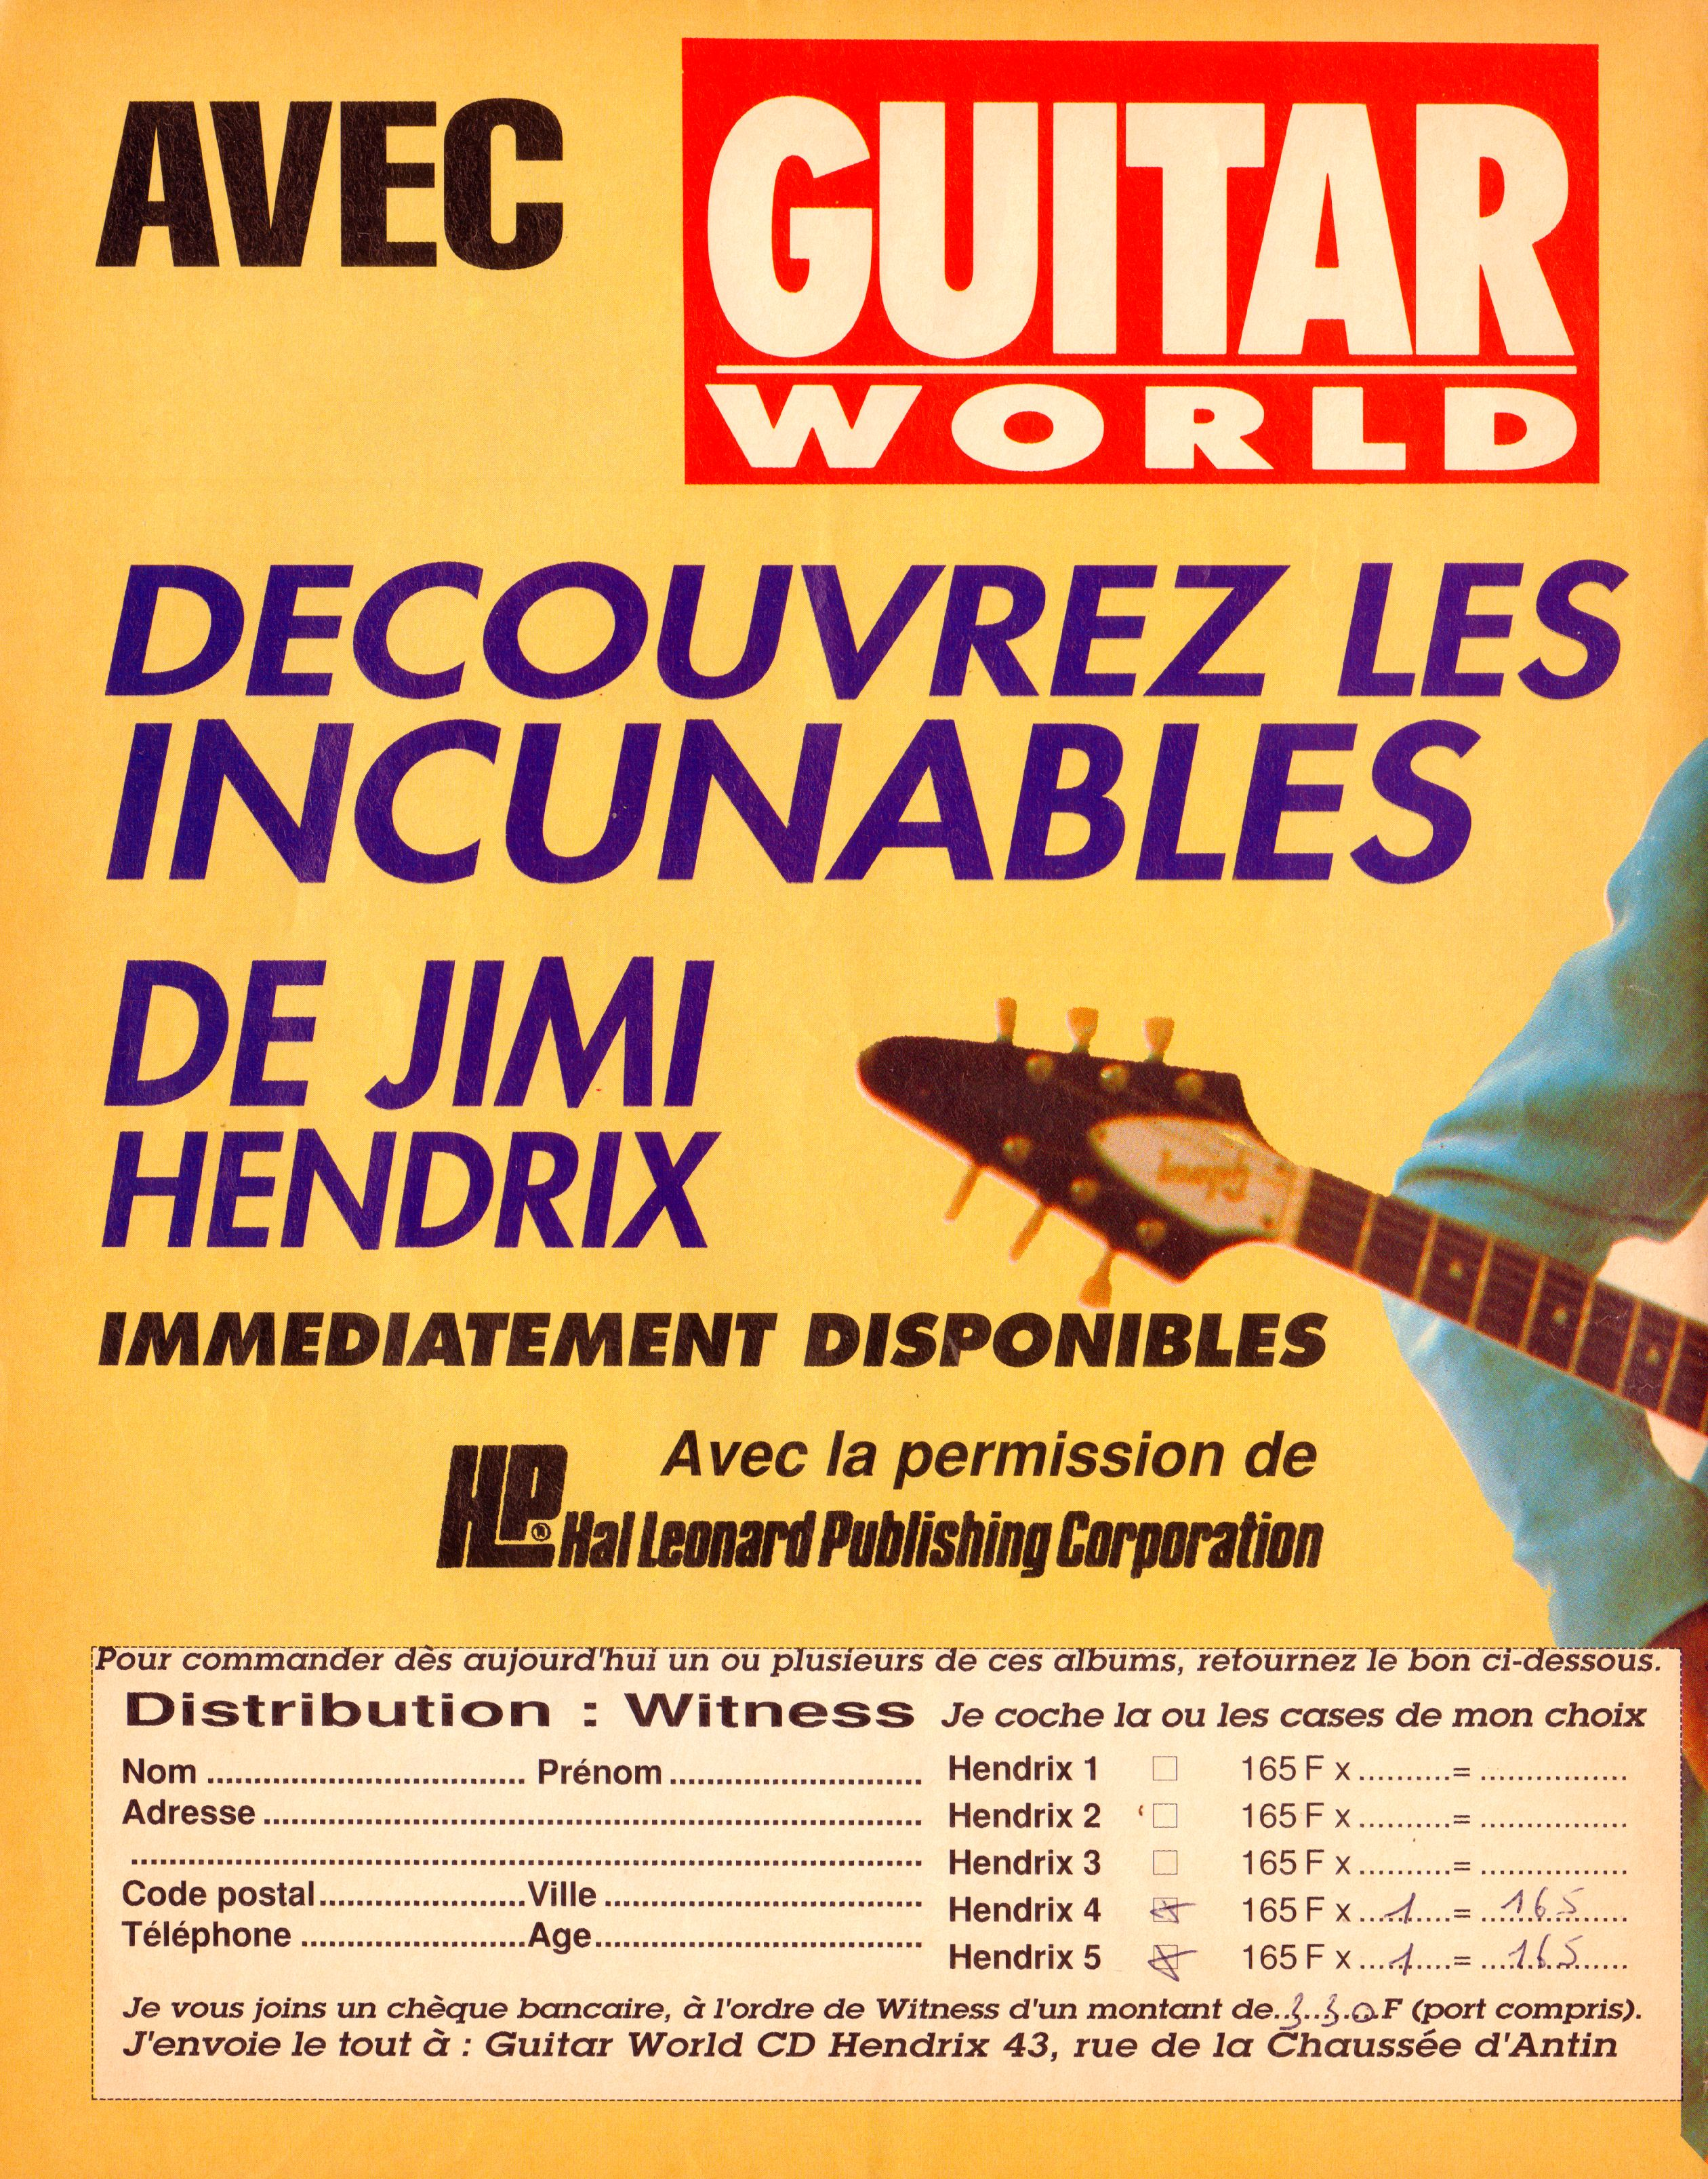 Magazines Français 1989 - 2014 GuitarWorldAvrilMaiJuin1990Page09